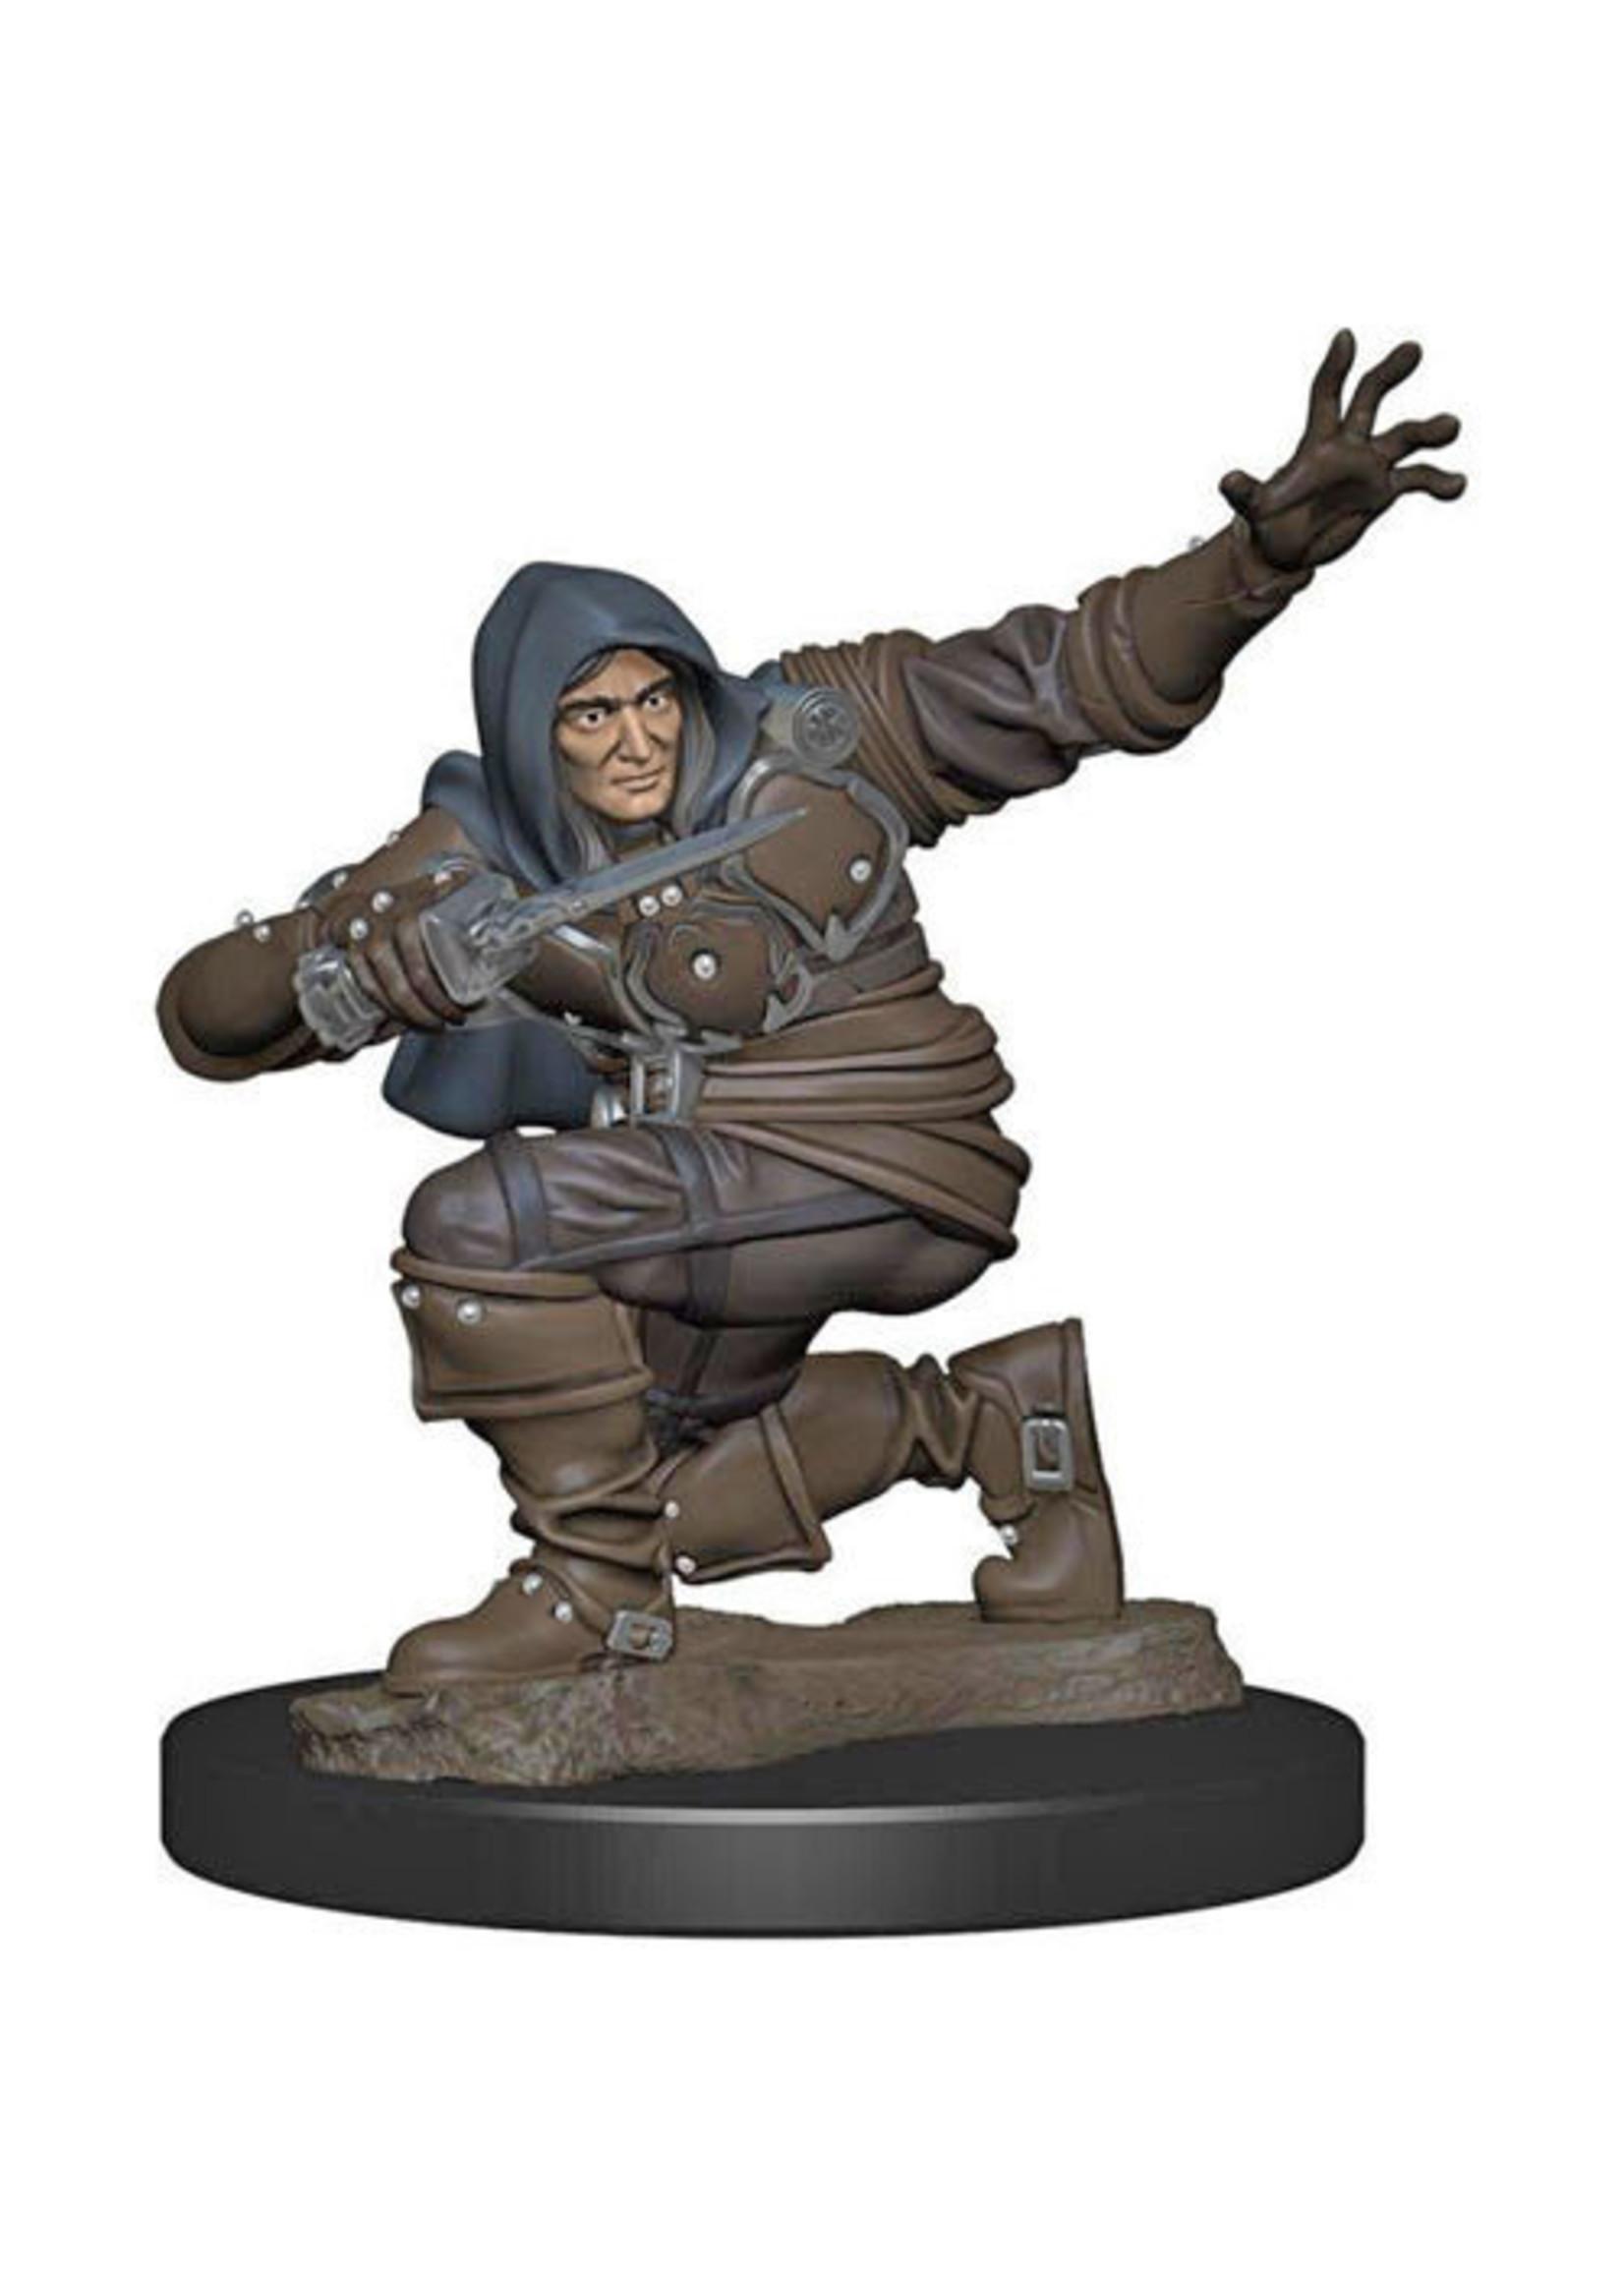 Pathfinder Battles: Premium Painted Figure - W1 Human Rogue Male